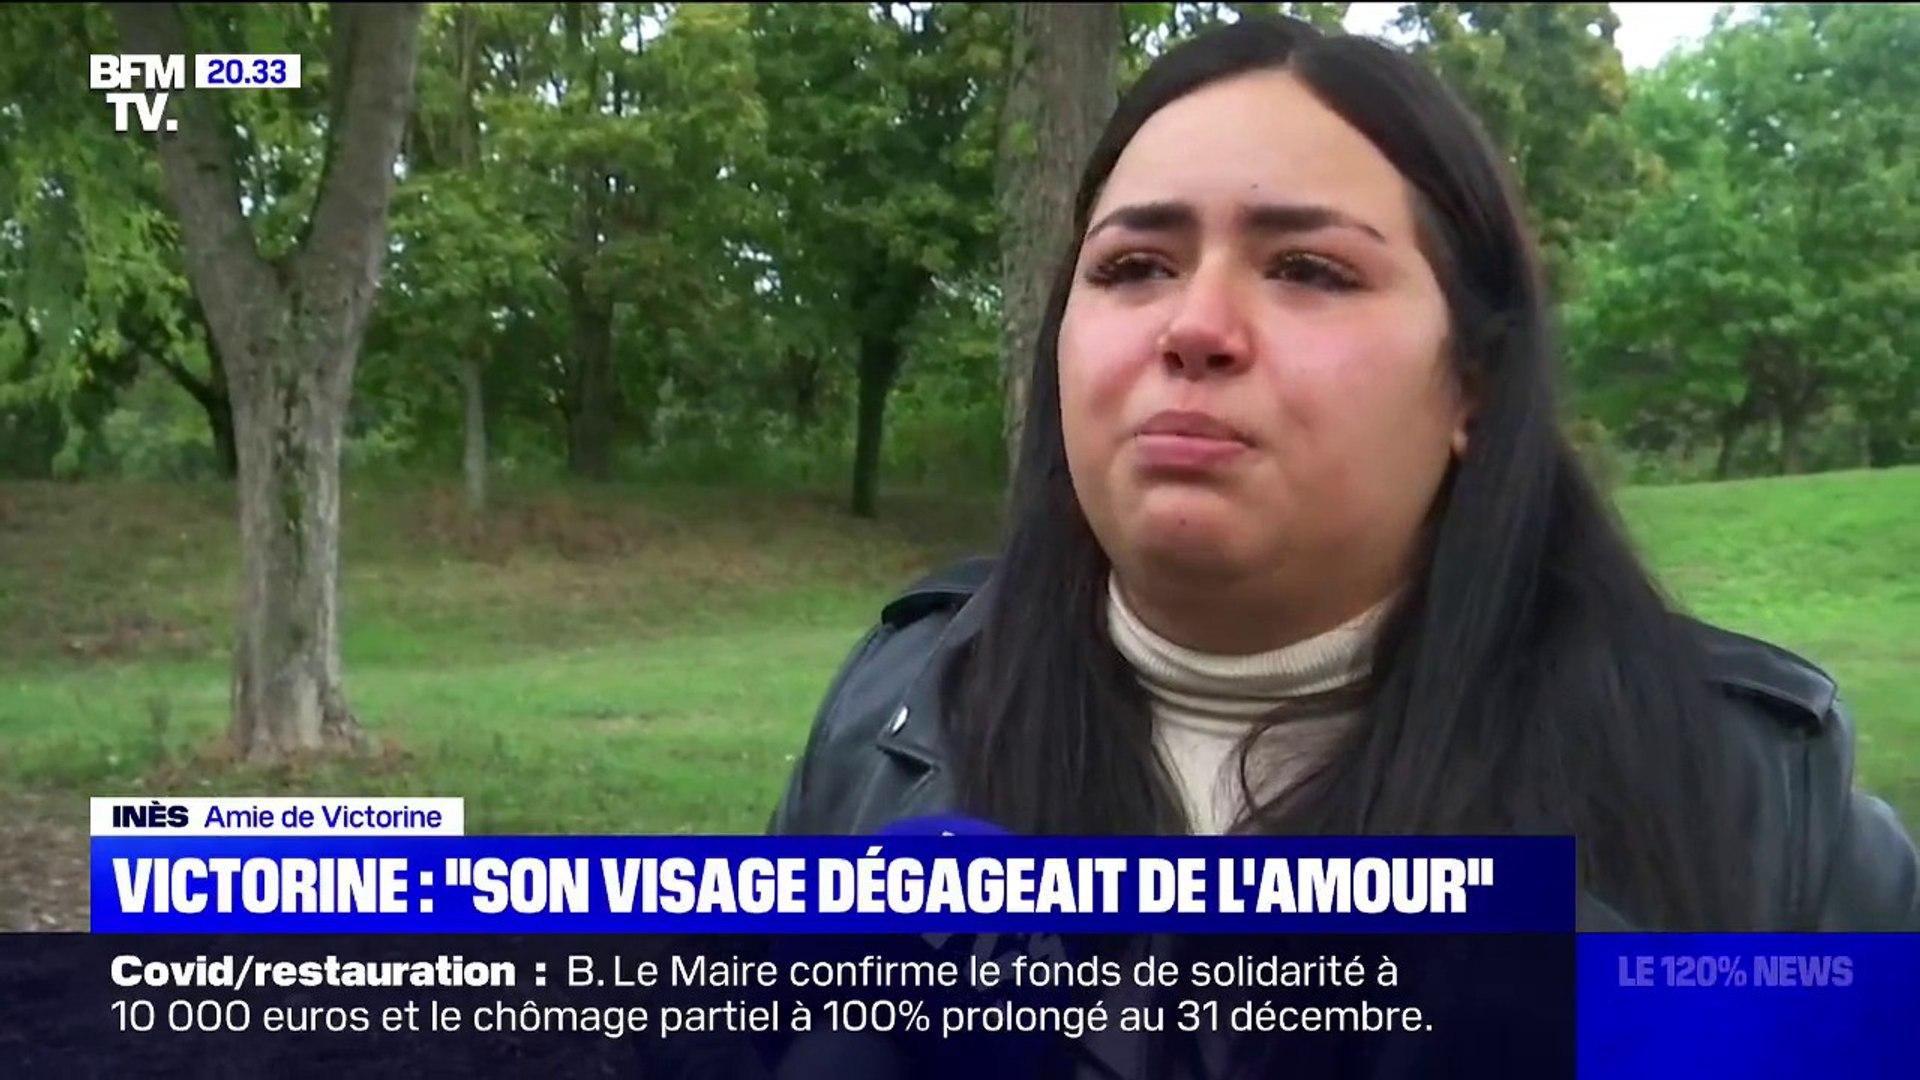 Son Visage Degageait De L Amour Ines Une Amie De Victorine Temoigne Video Dailymotion